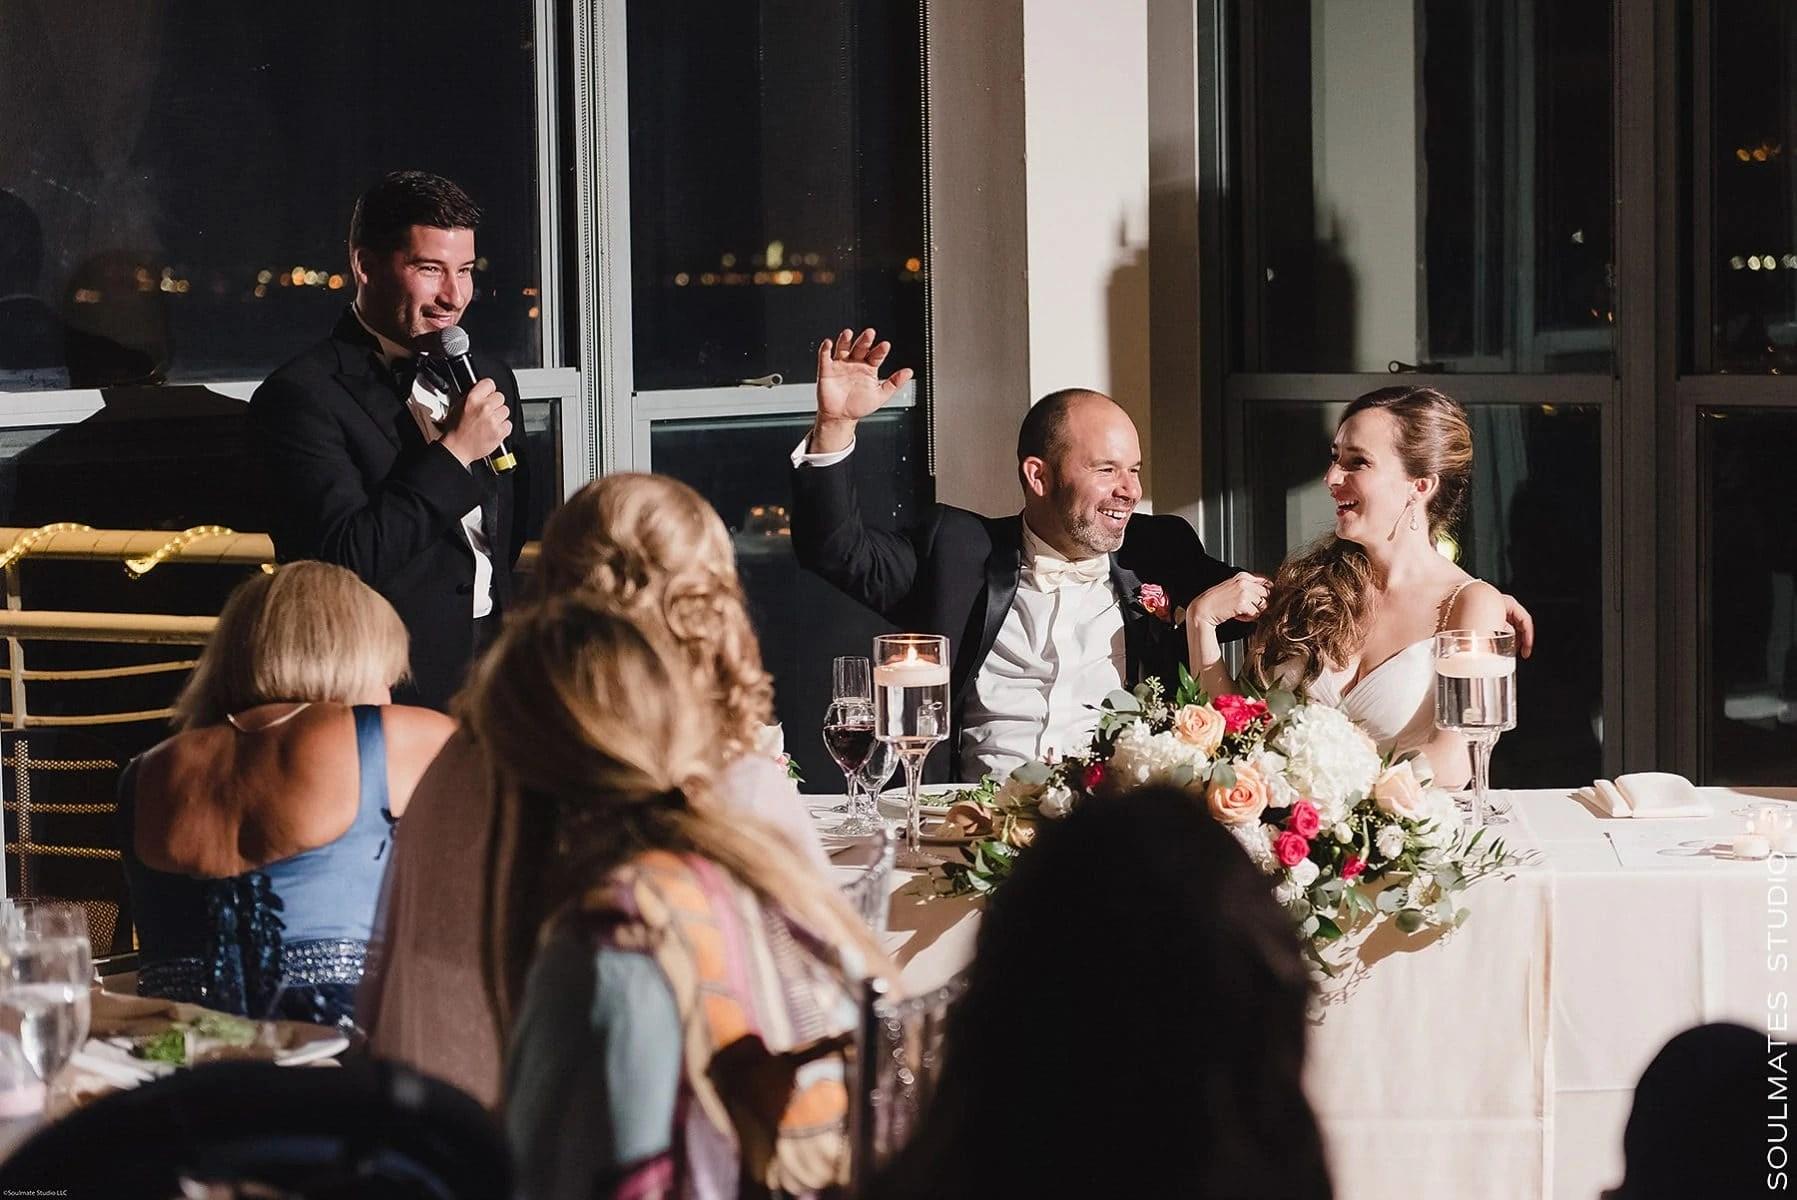 Wedding reception at Battery Gardens Wedding Venue